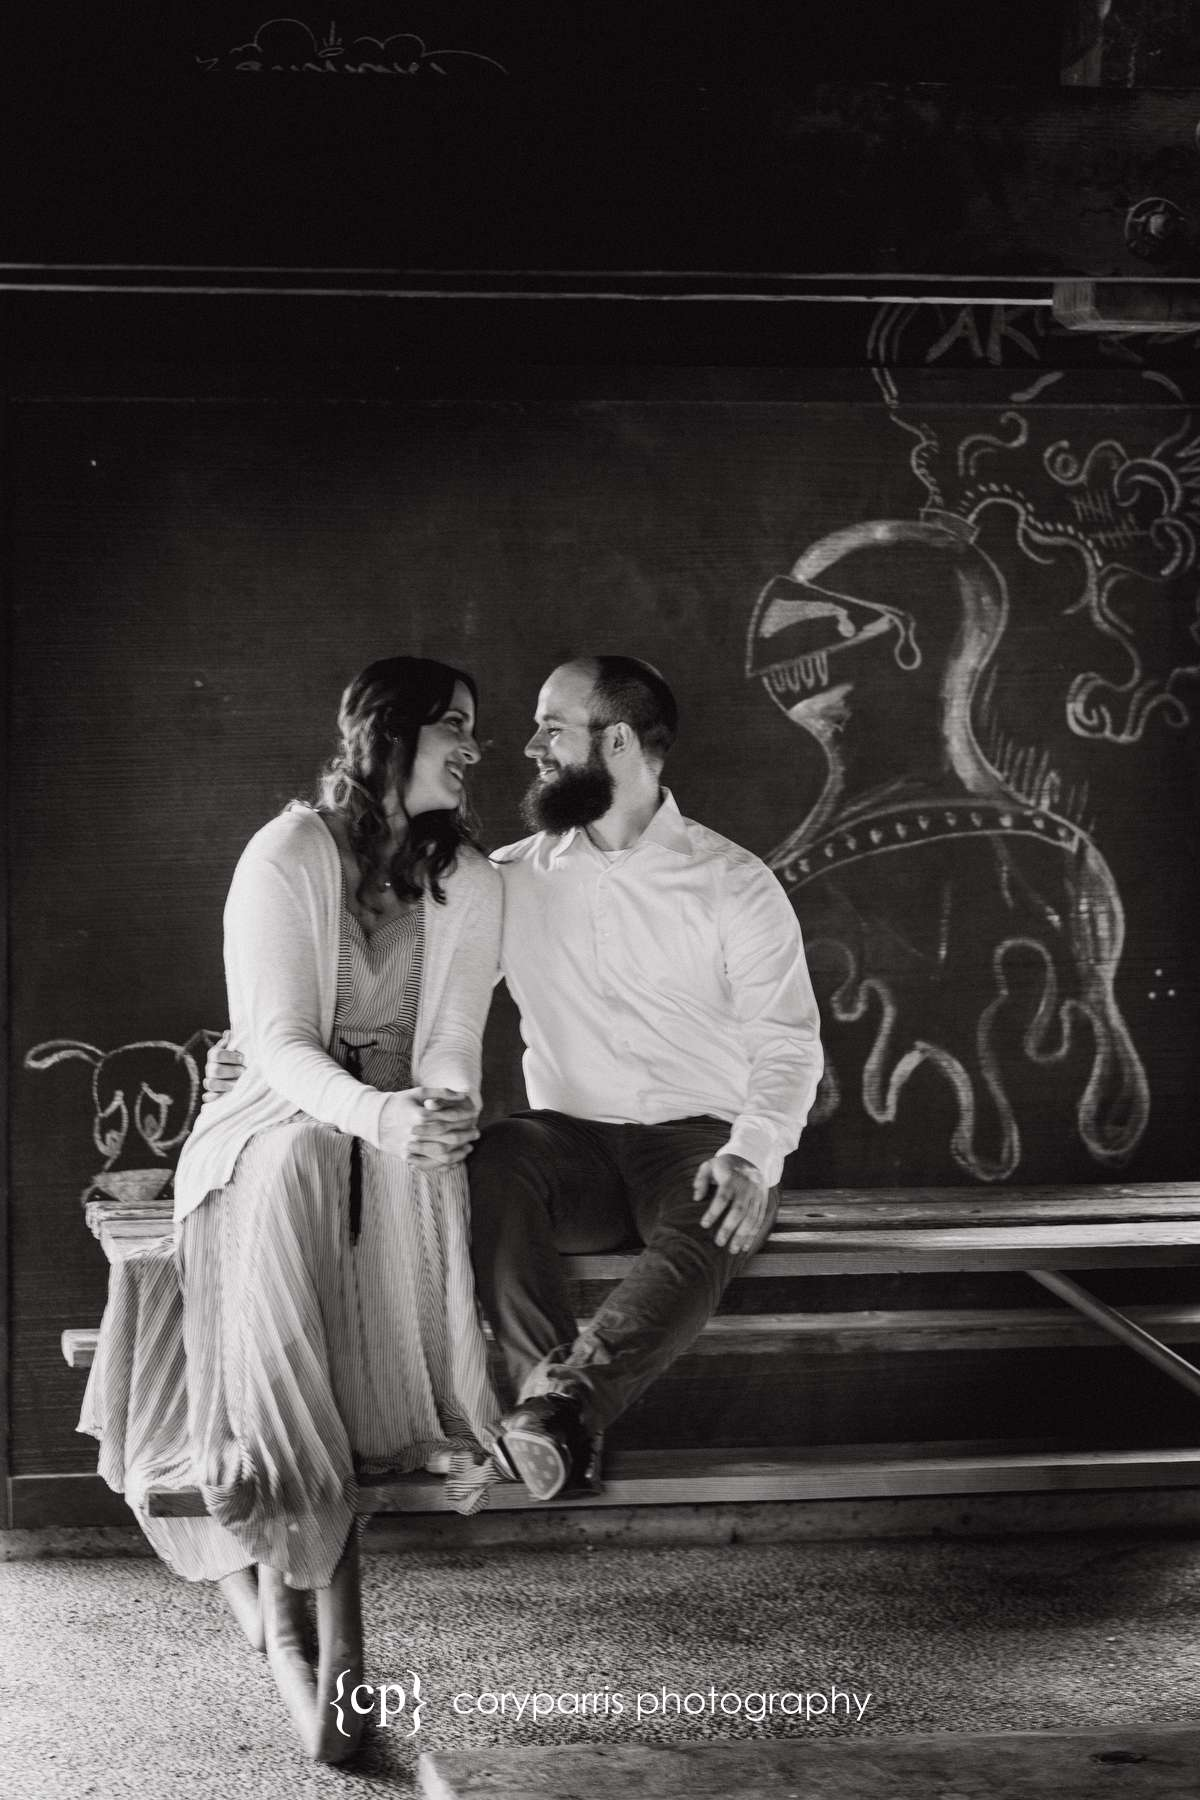 024-Engagement-Portraits-Marrymoor-Park.jpg